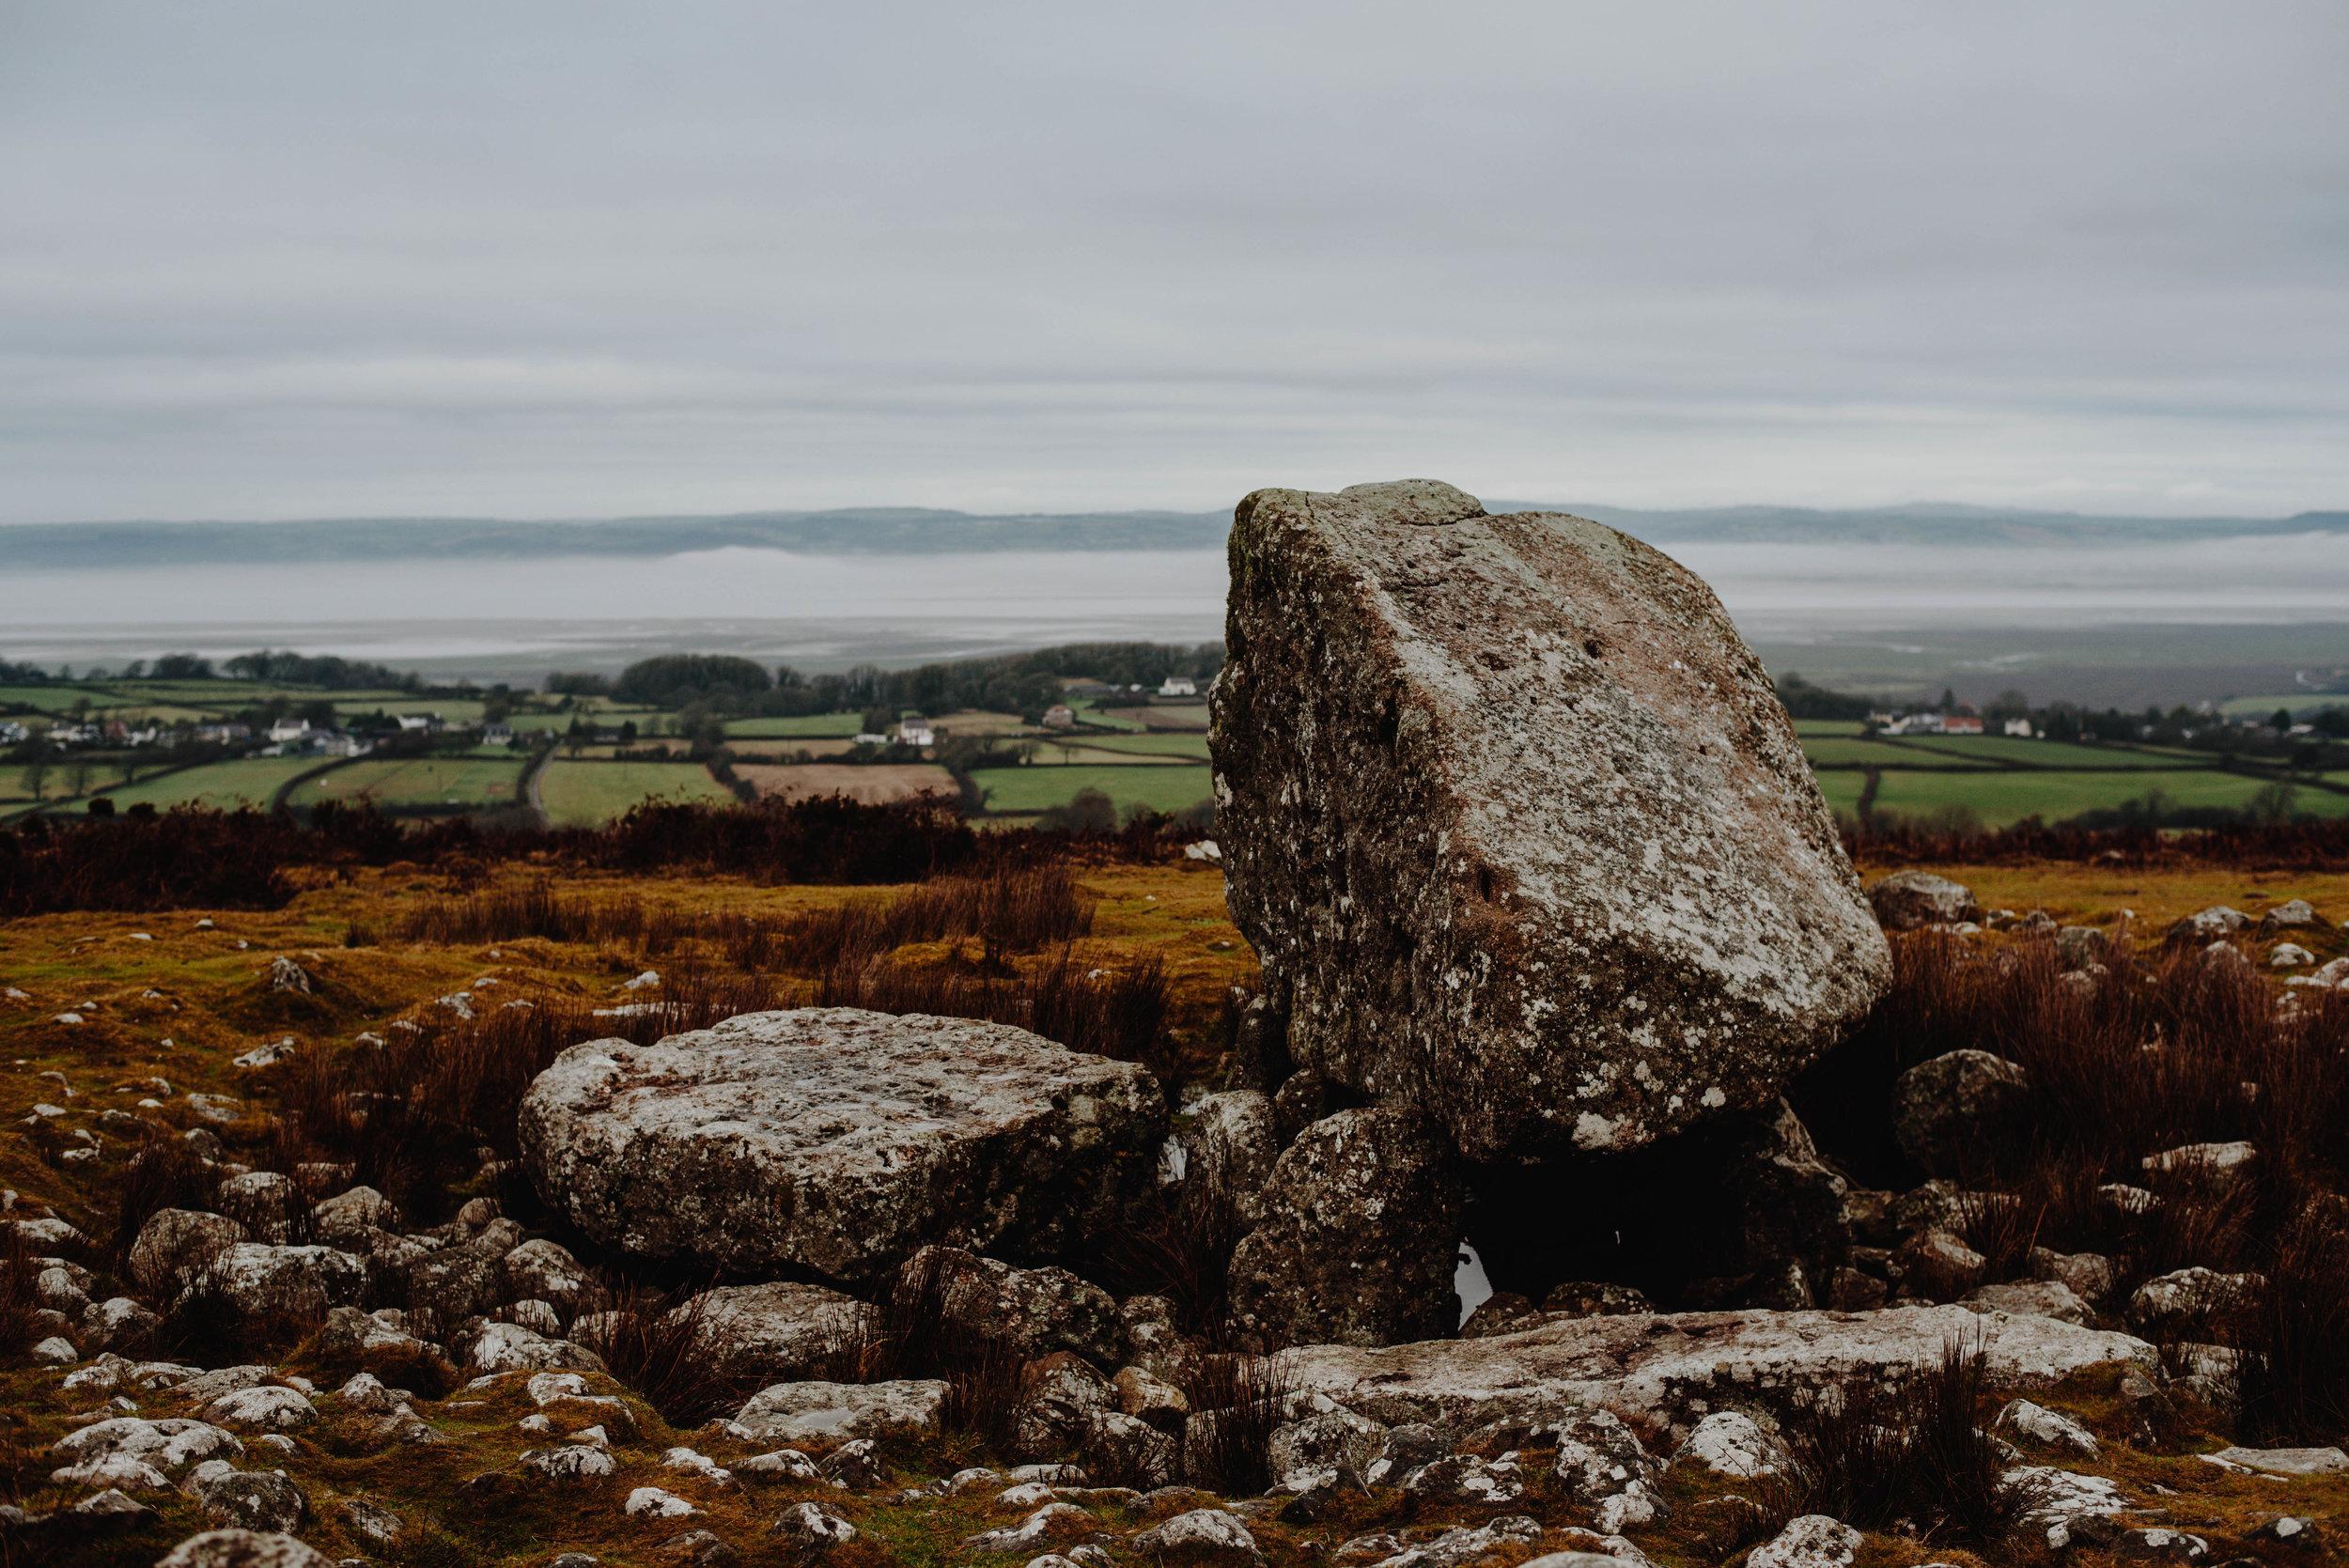 Arthur's Stone  SS:1/250 F:3.5 ISO:160 WB: Cloudy. 50mm Lens. Single Spot Focus.